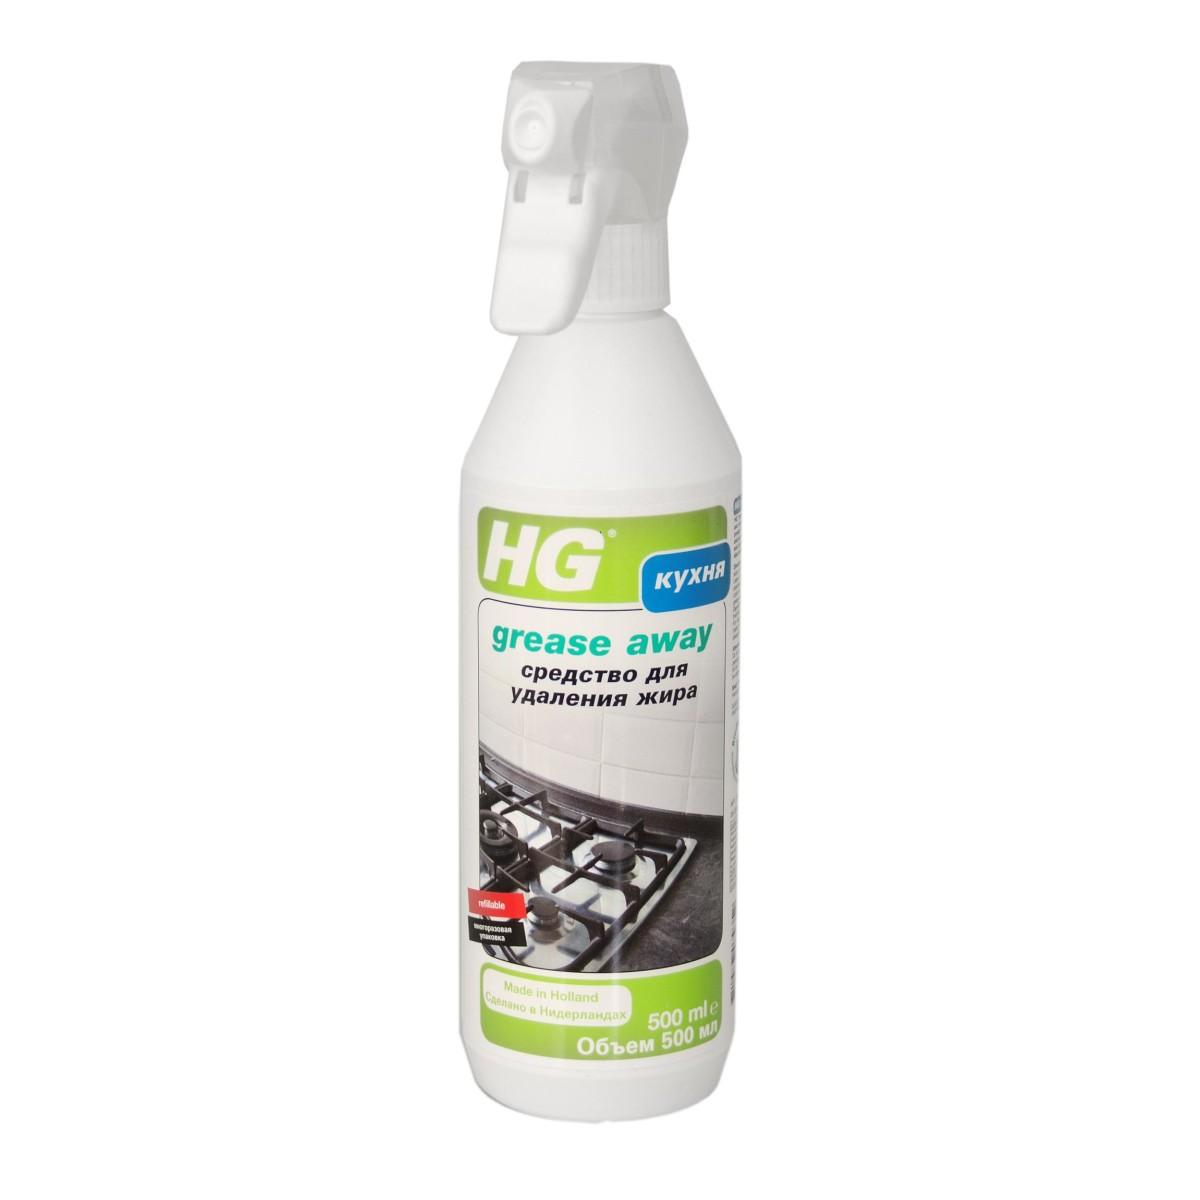 Средство для удаления жира HG 0.5 л